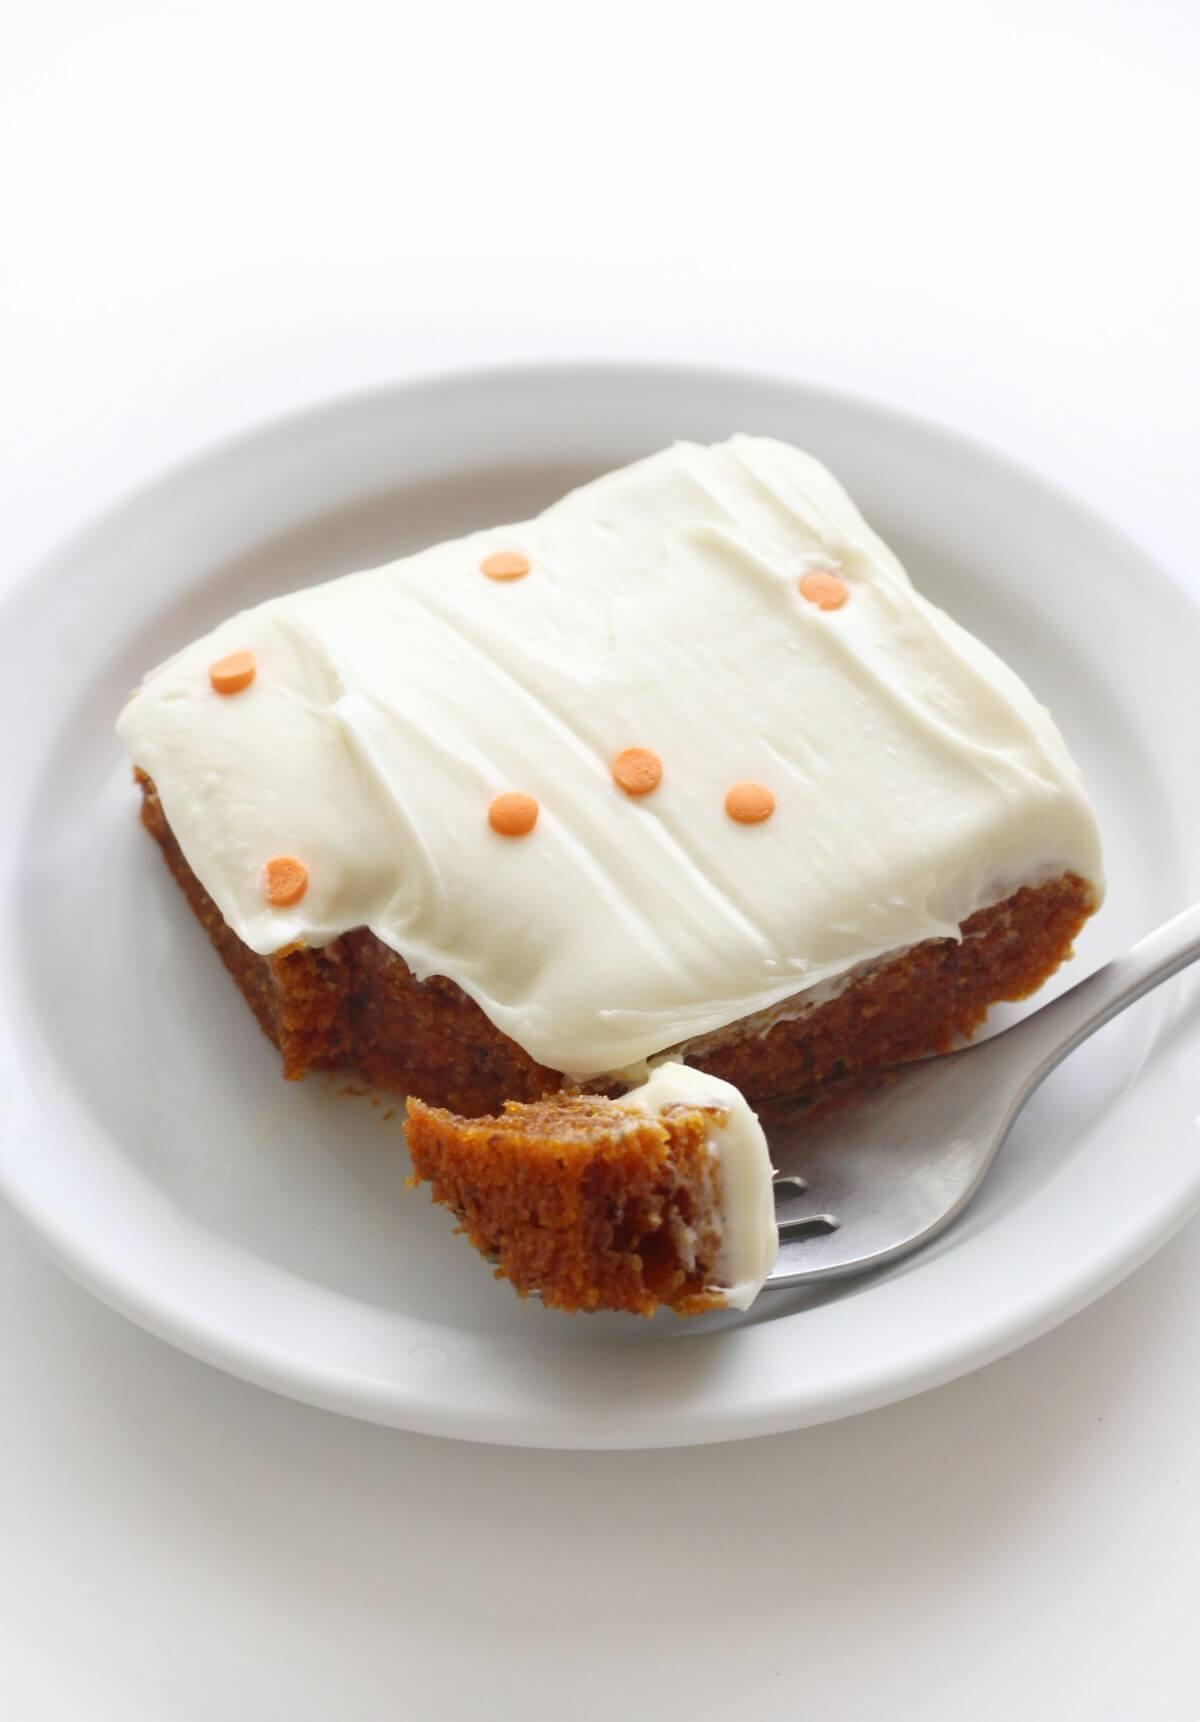 slice of gluten-free pumpkin cake on plate with fork bite